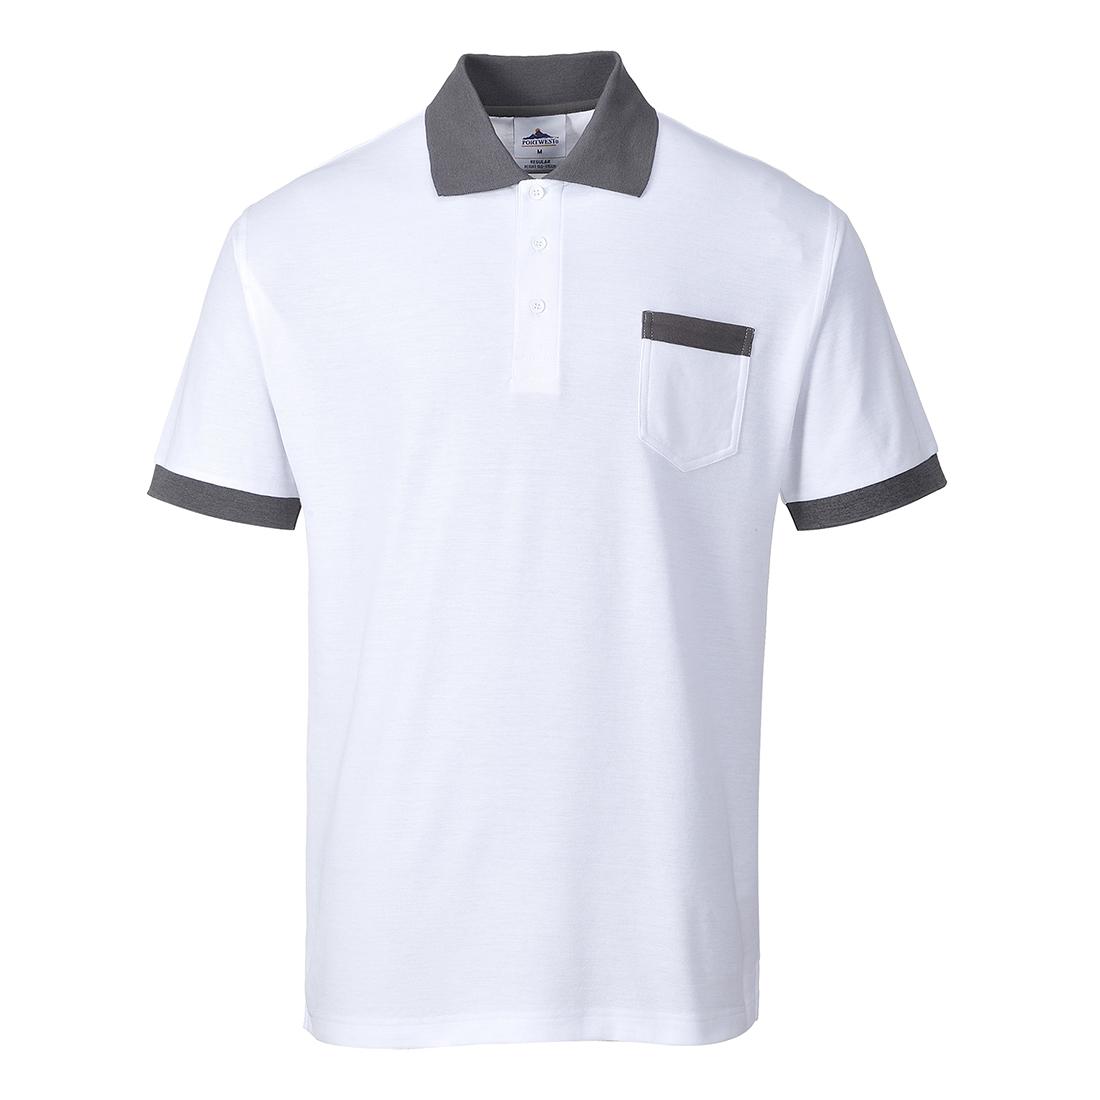 0e3127e30d Portwest Craft póló fehér